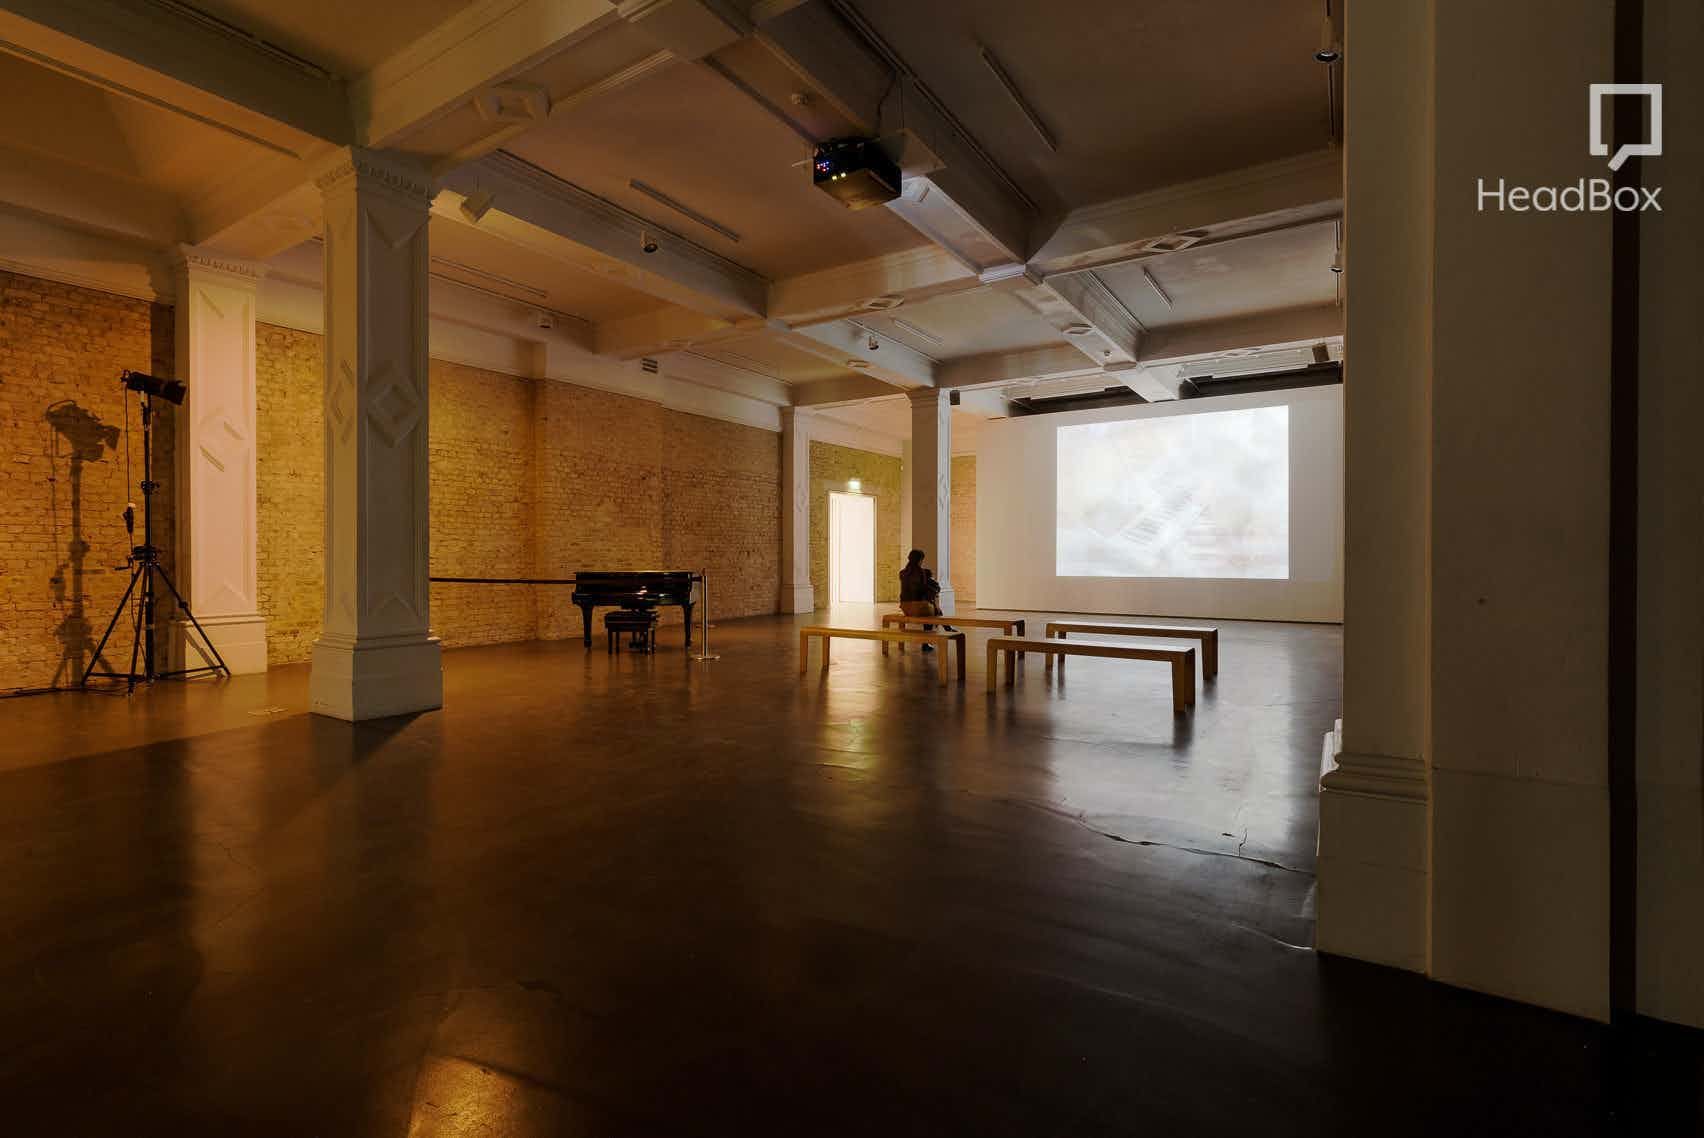 Gallery 2, Whitechapel Gallery